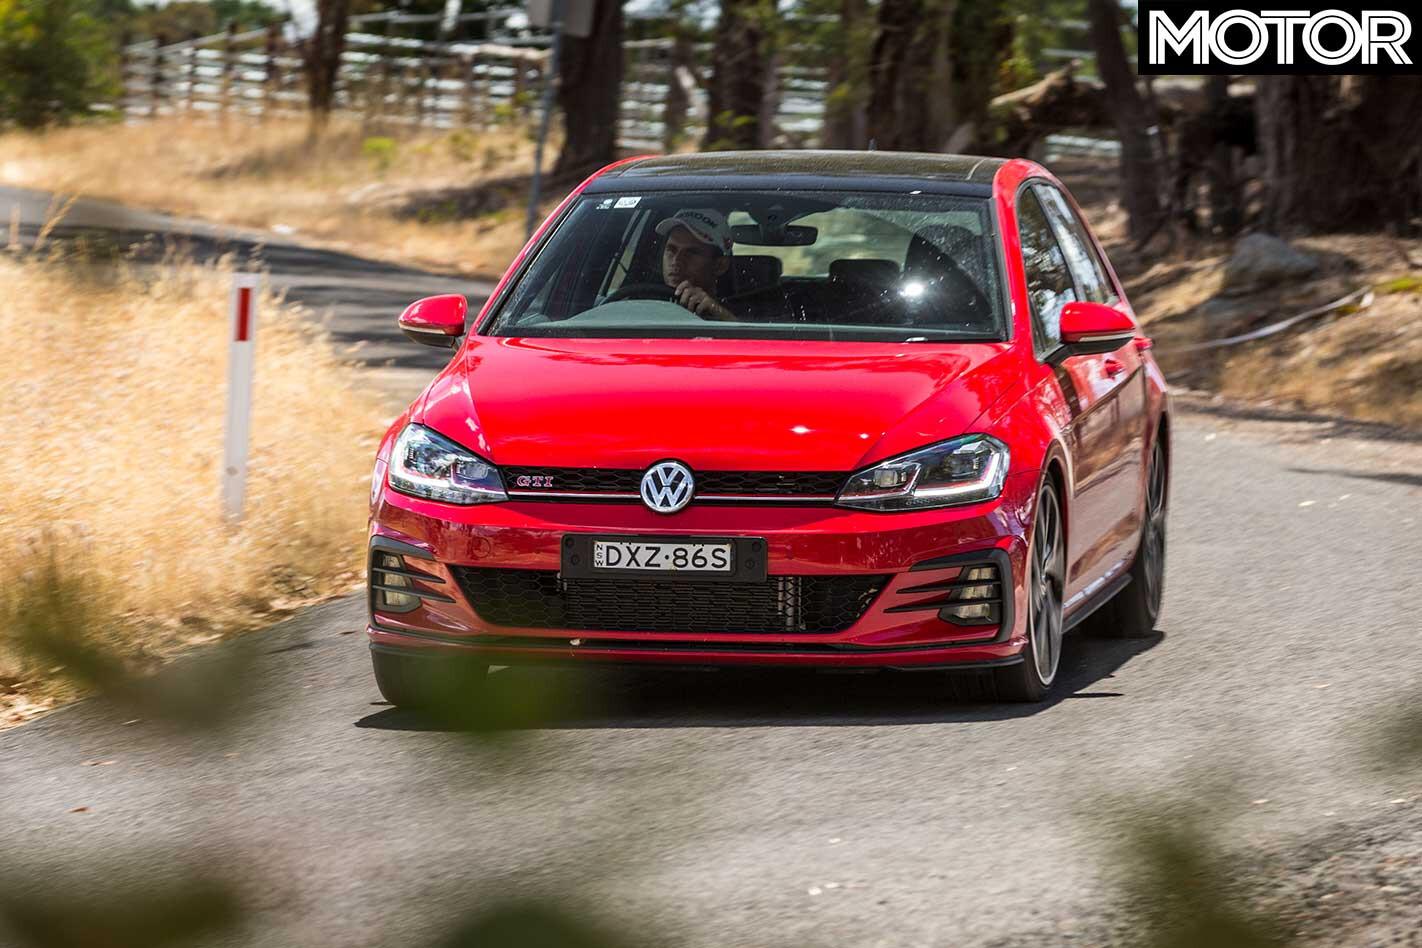 2019 Volkswagen Golf GTI Performance Jpg